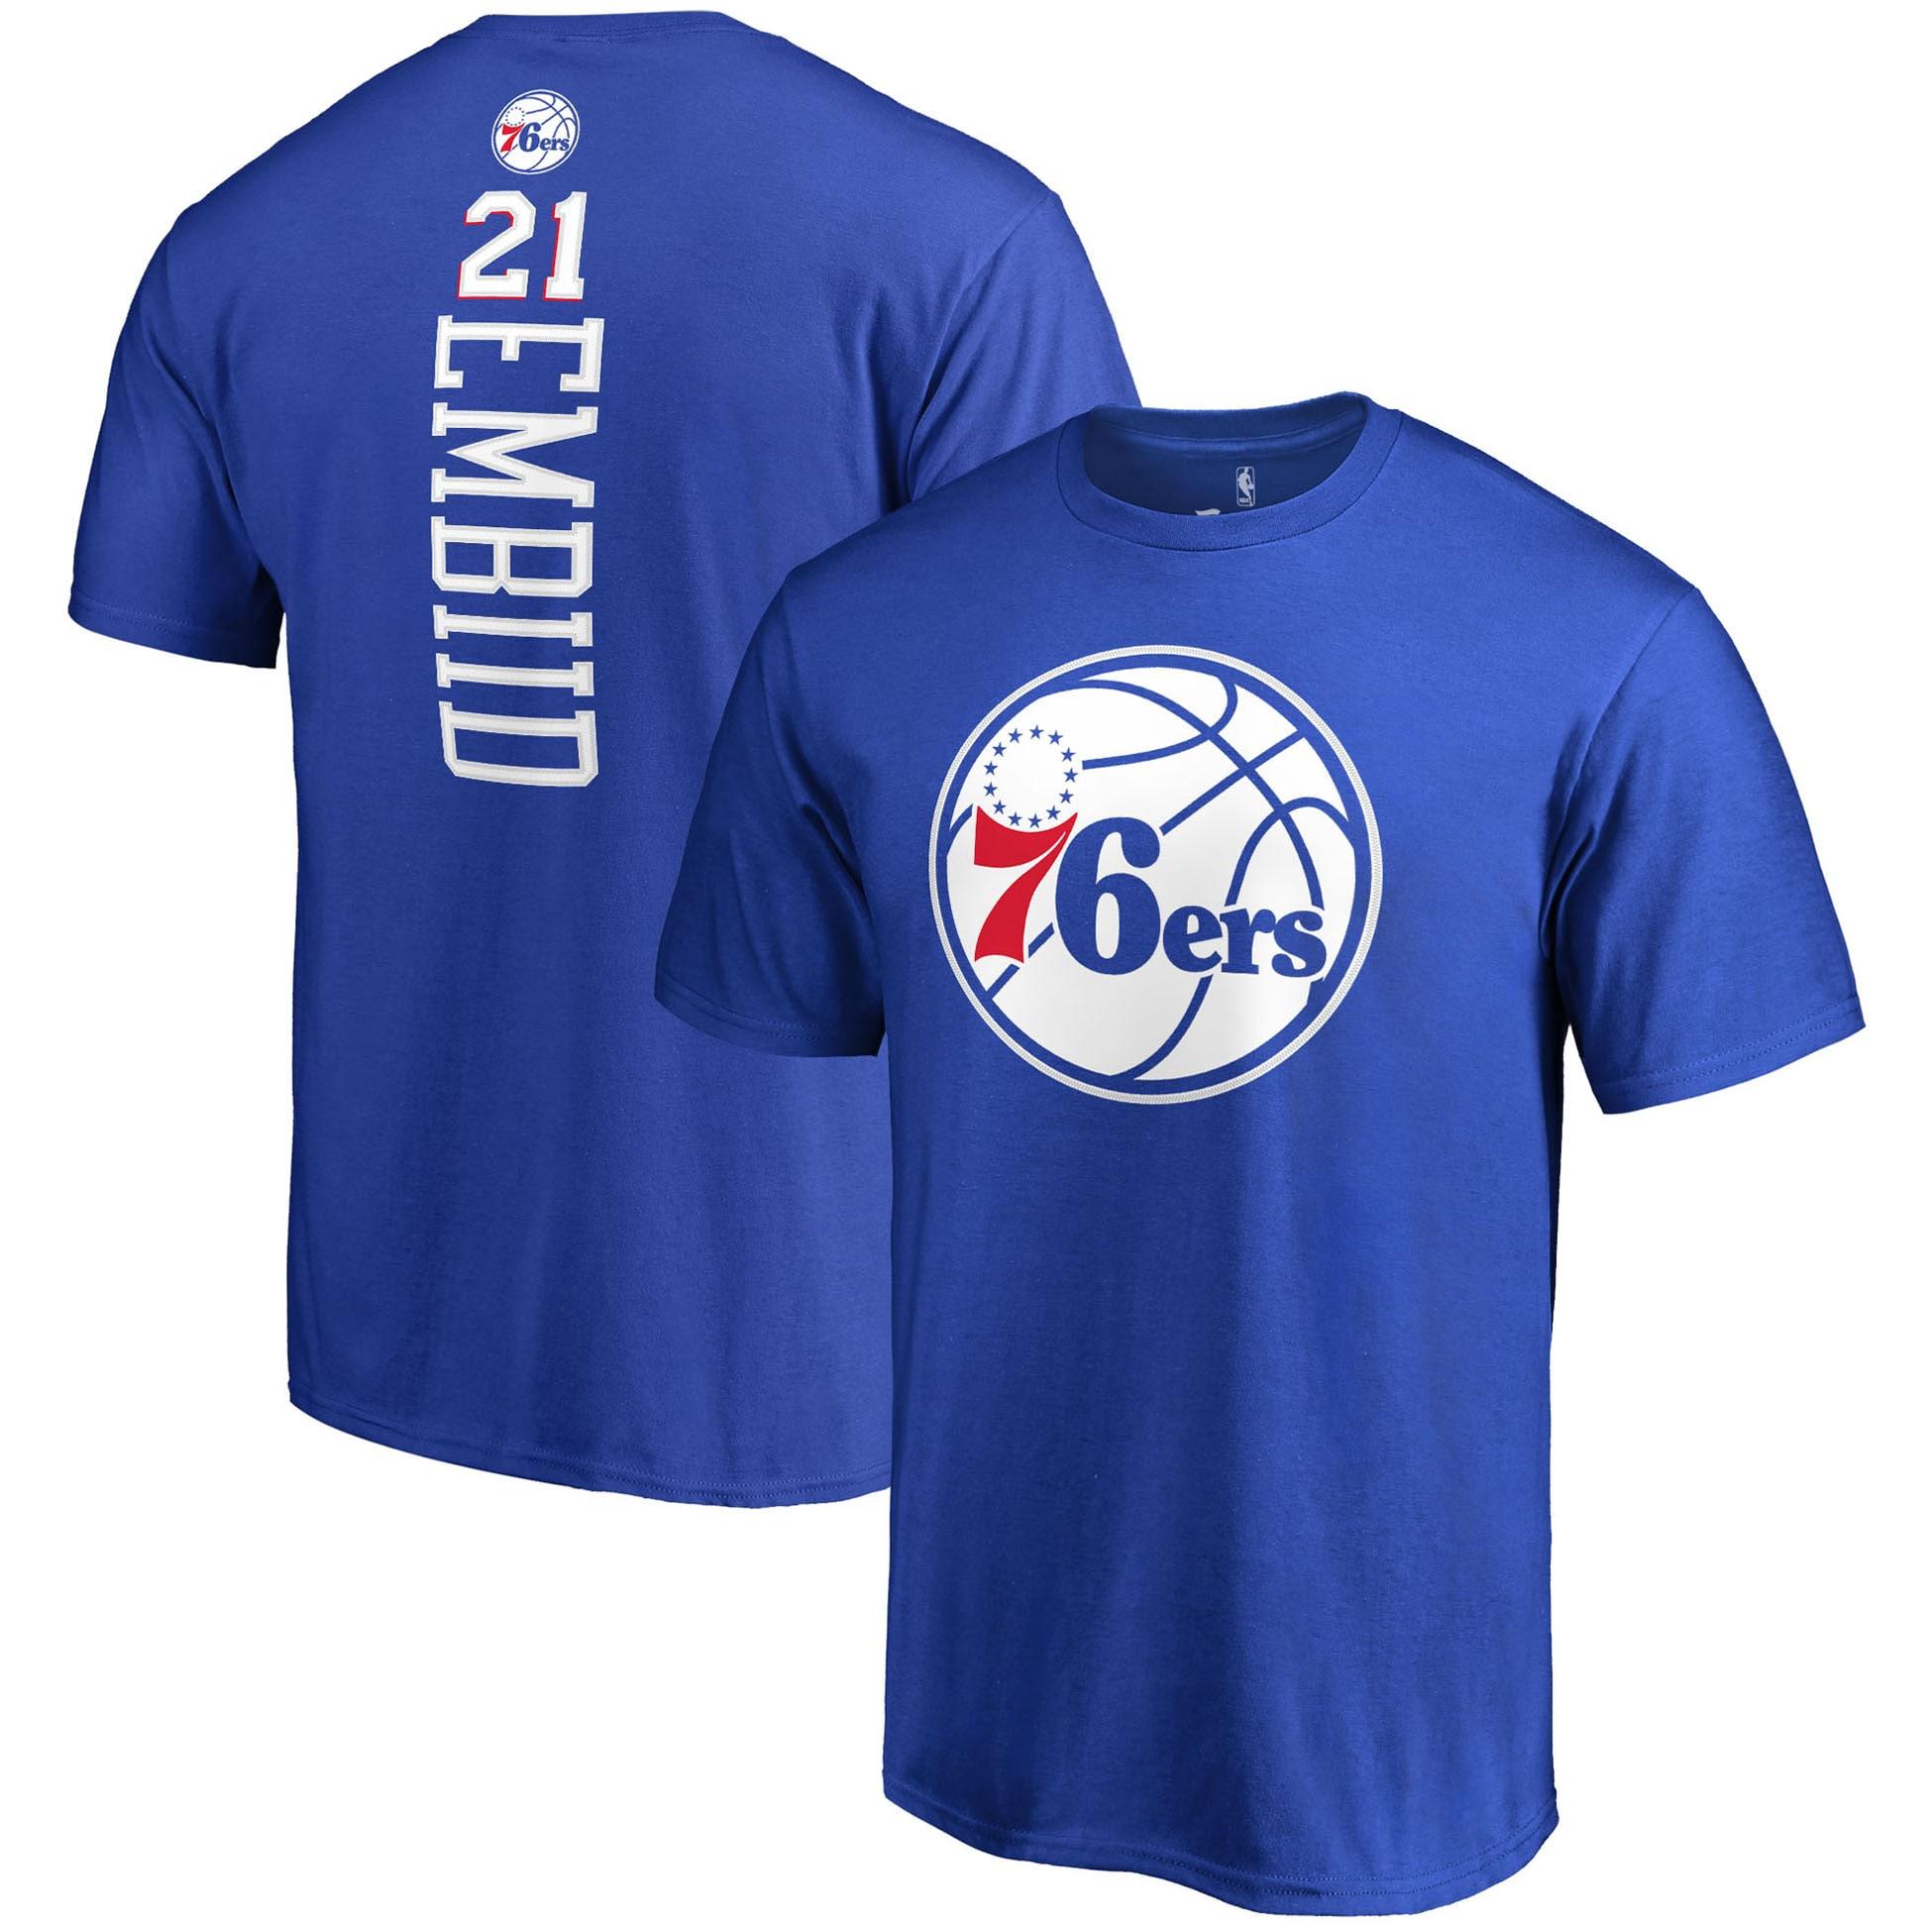 Joel Embiid Philadelphia 76ers Fanatics Branded Team Backer Name & Number T-Shirt - Royal